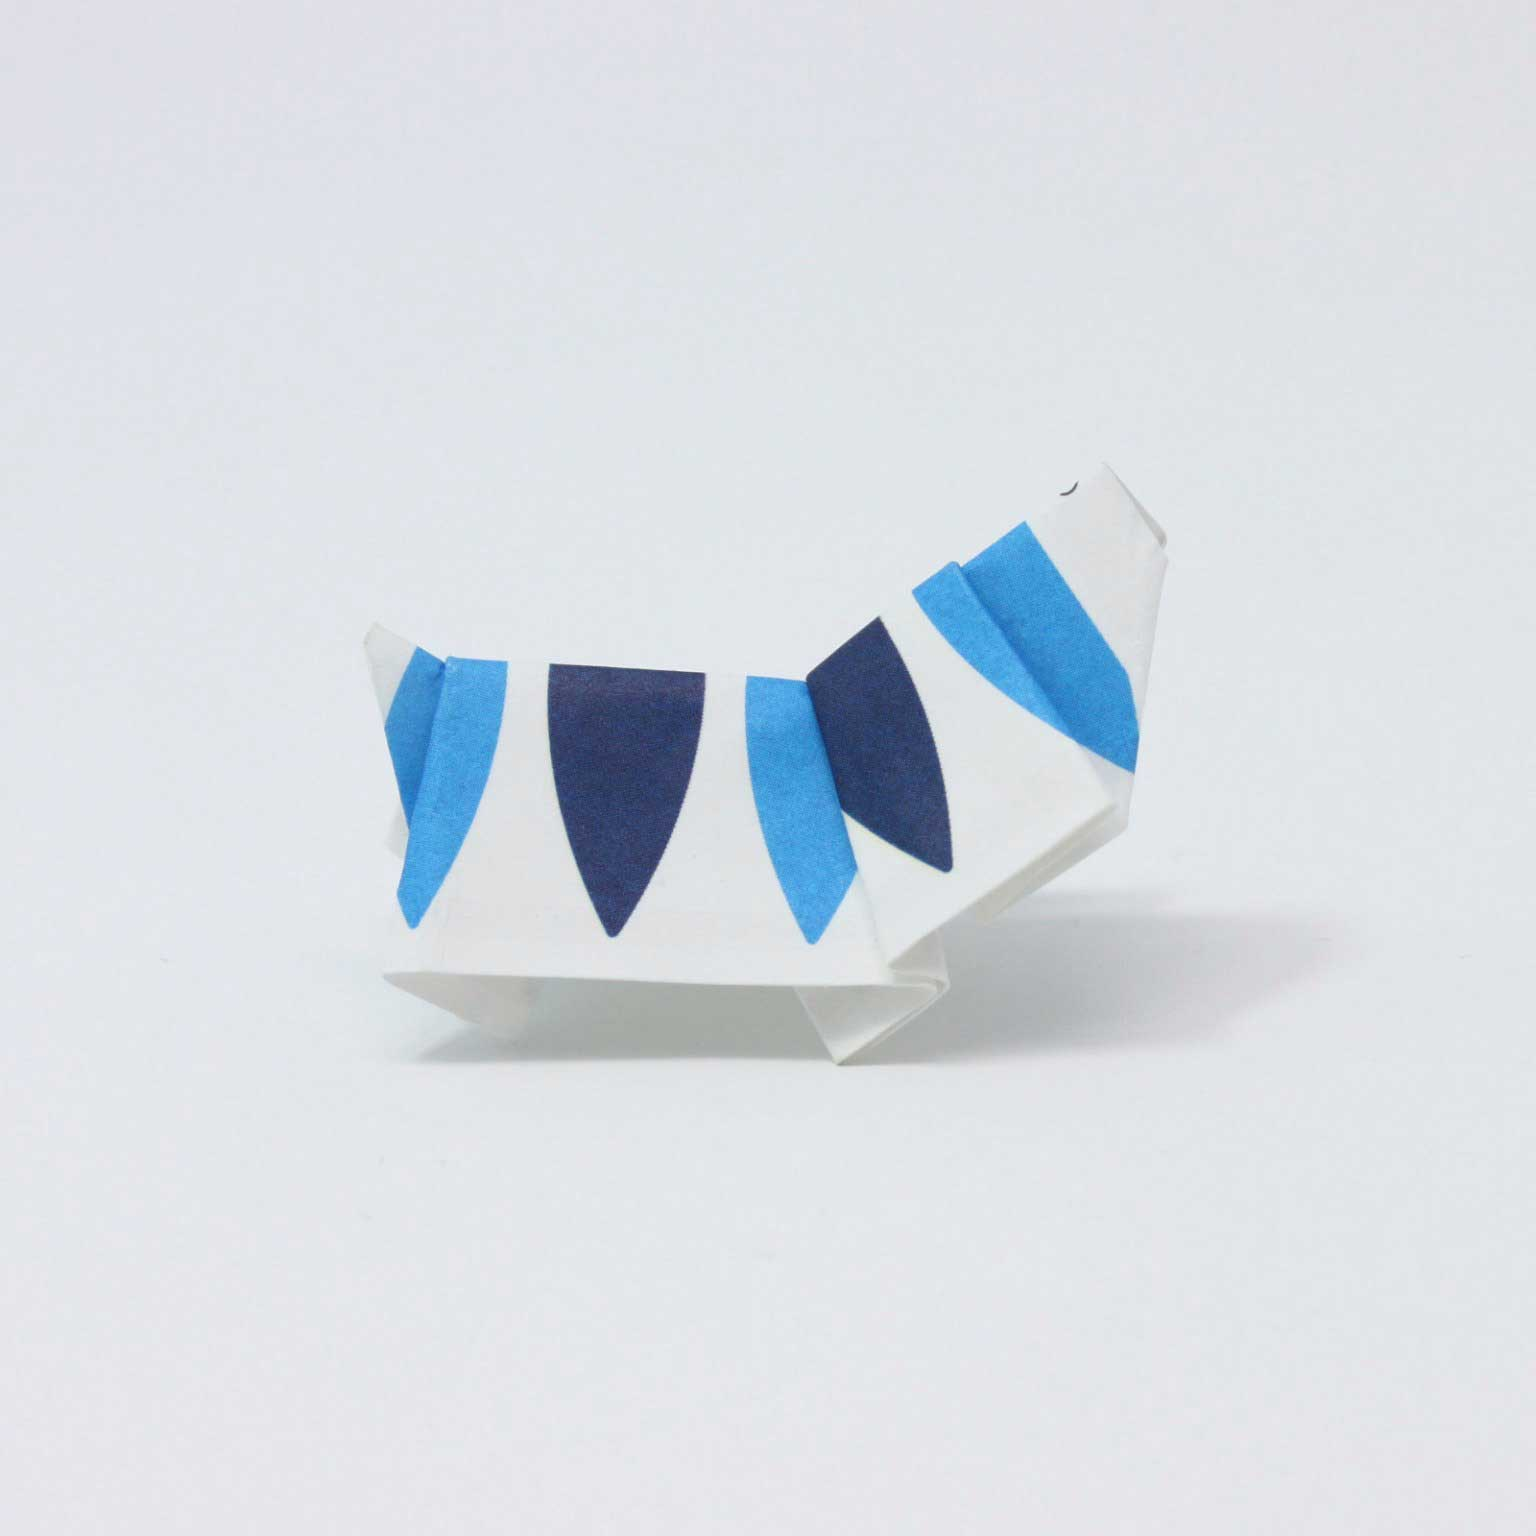 Hinterlassenes Origami aus Essstäbchen-Verpackungen japanese-tip_origami-trinkgeld_05